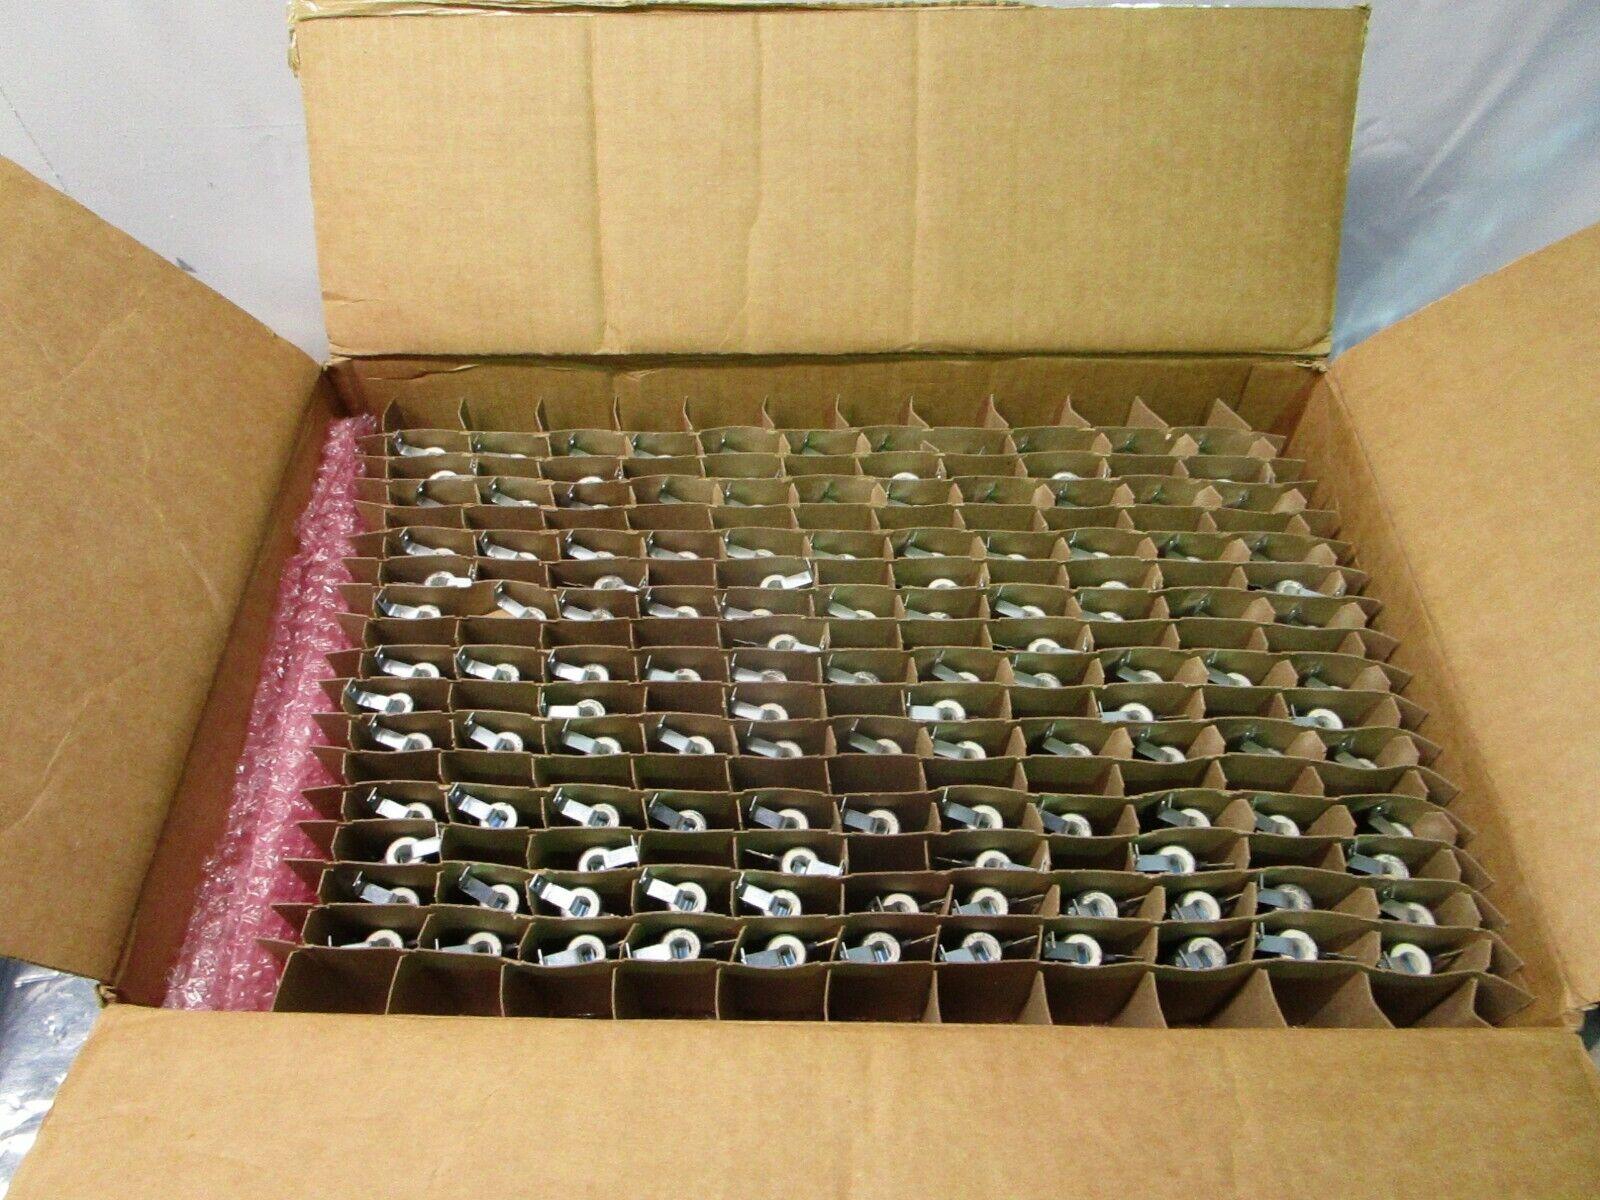 1 Lot of 250 Vishay FST02515E200R0JE92 Wirewound Resistor, 102365